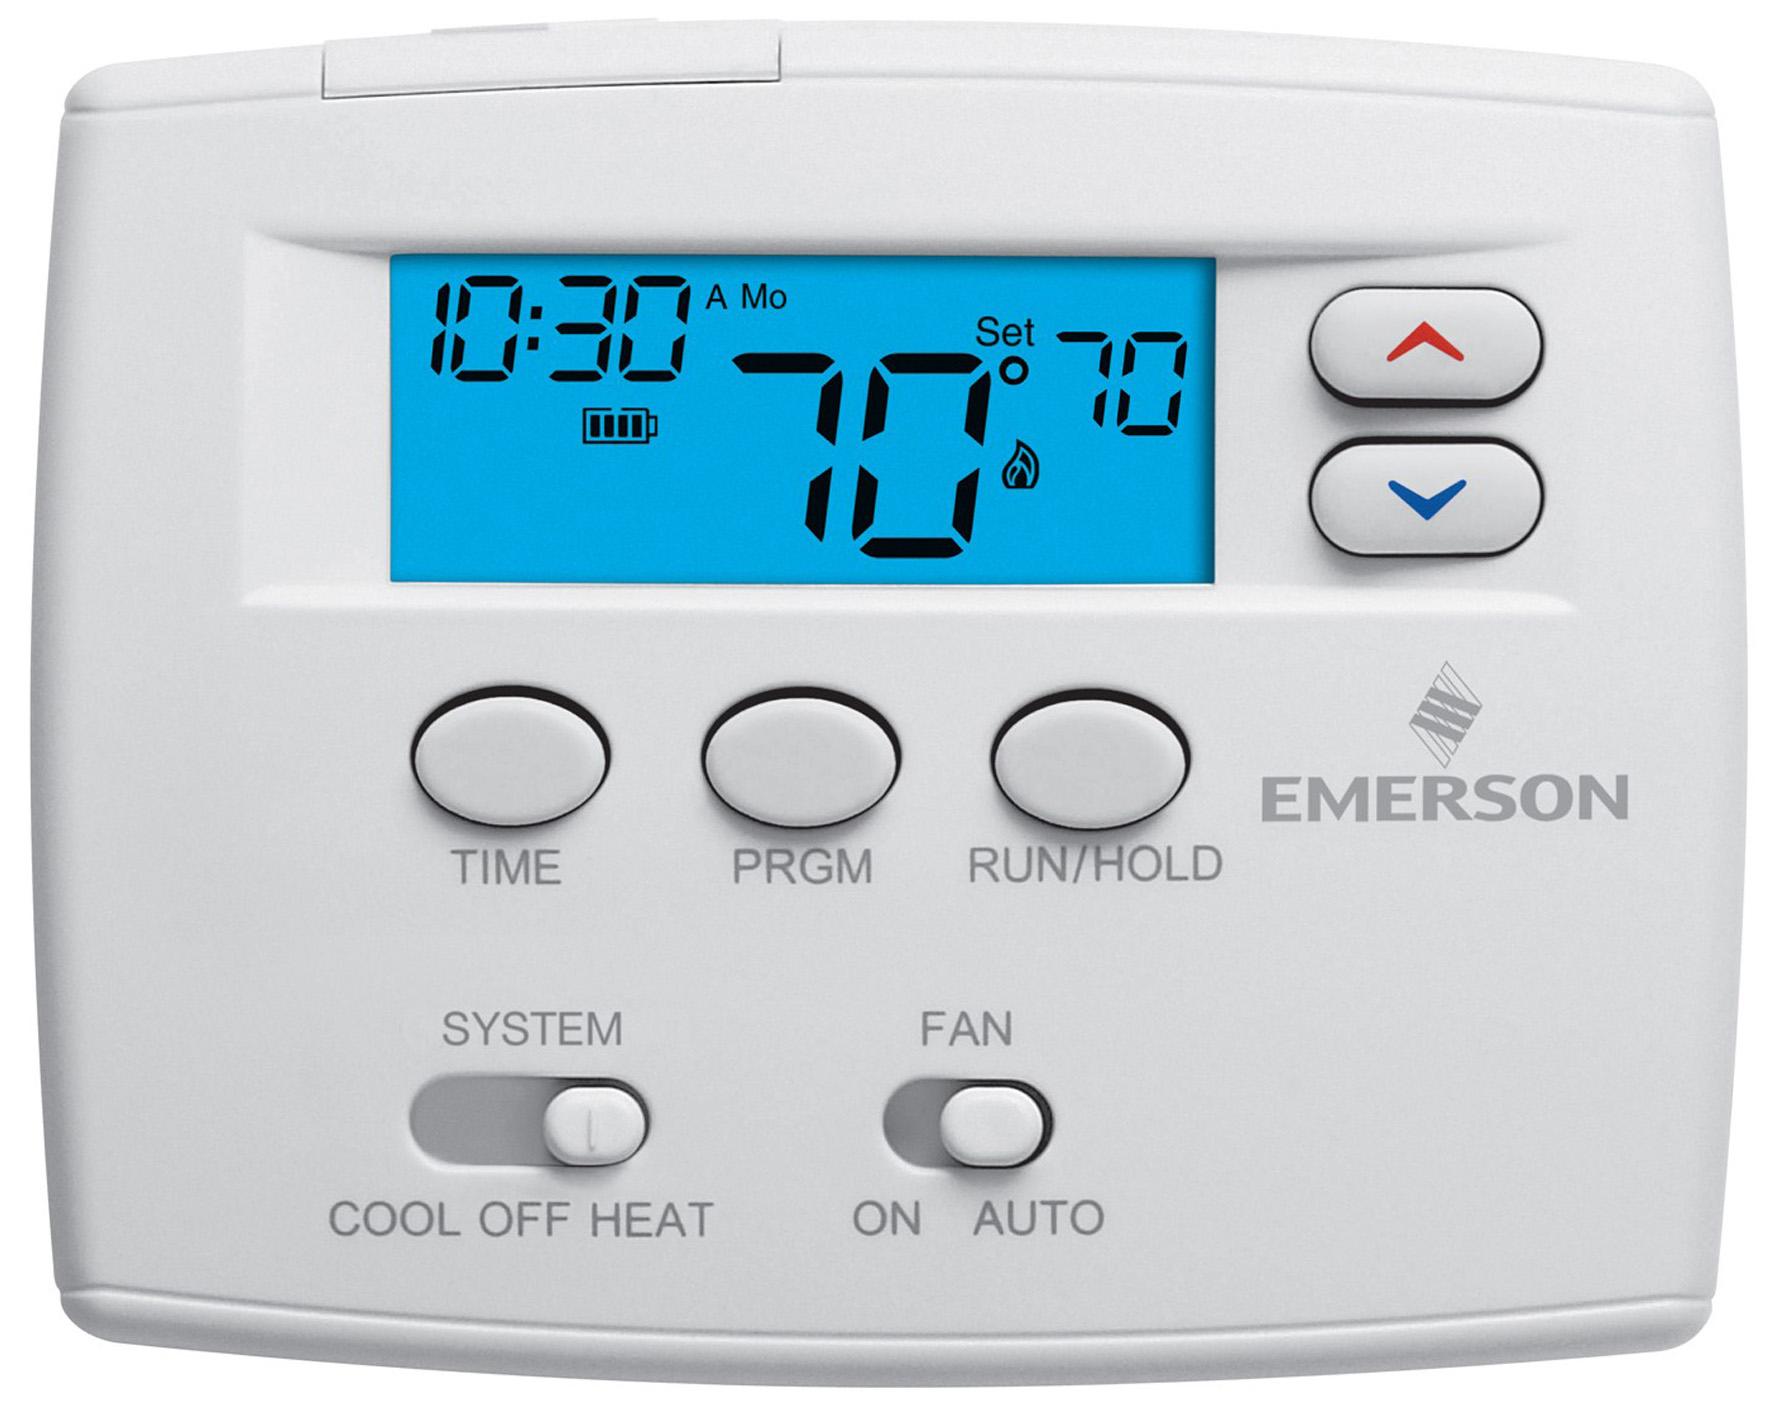 Troubleshooting Furnace Thermostat - Facias